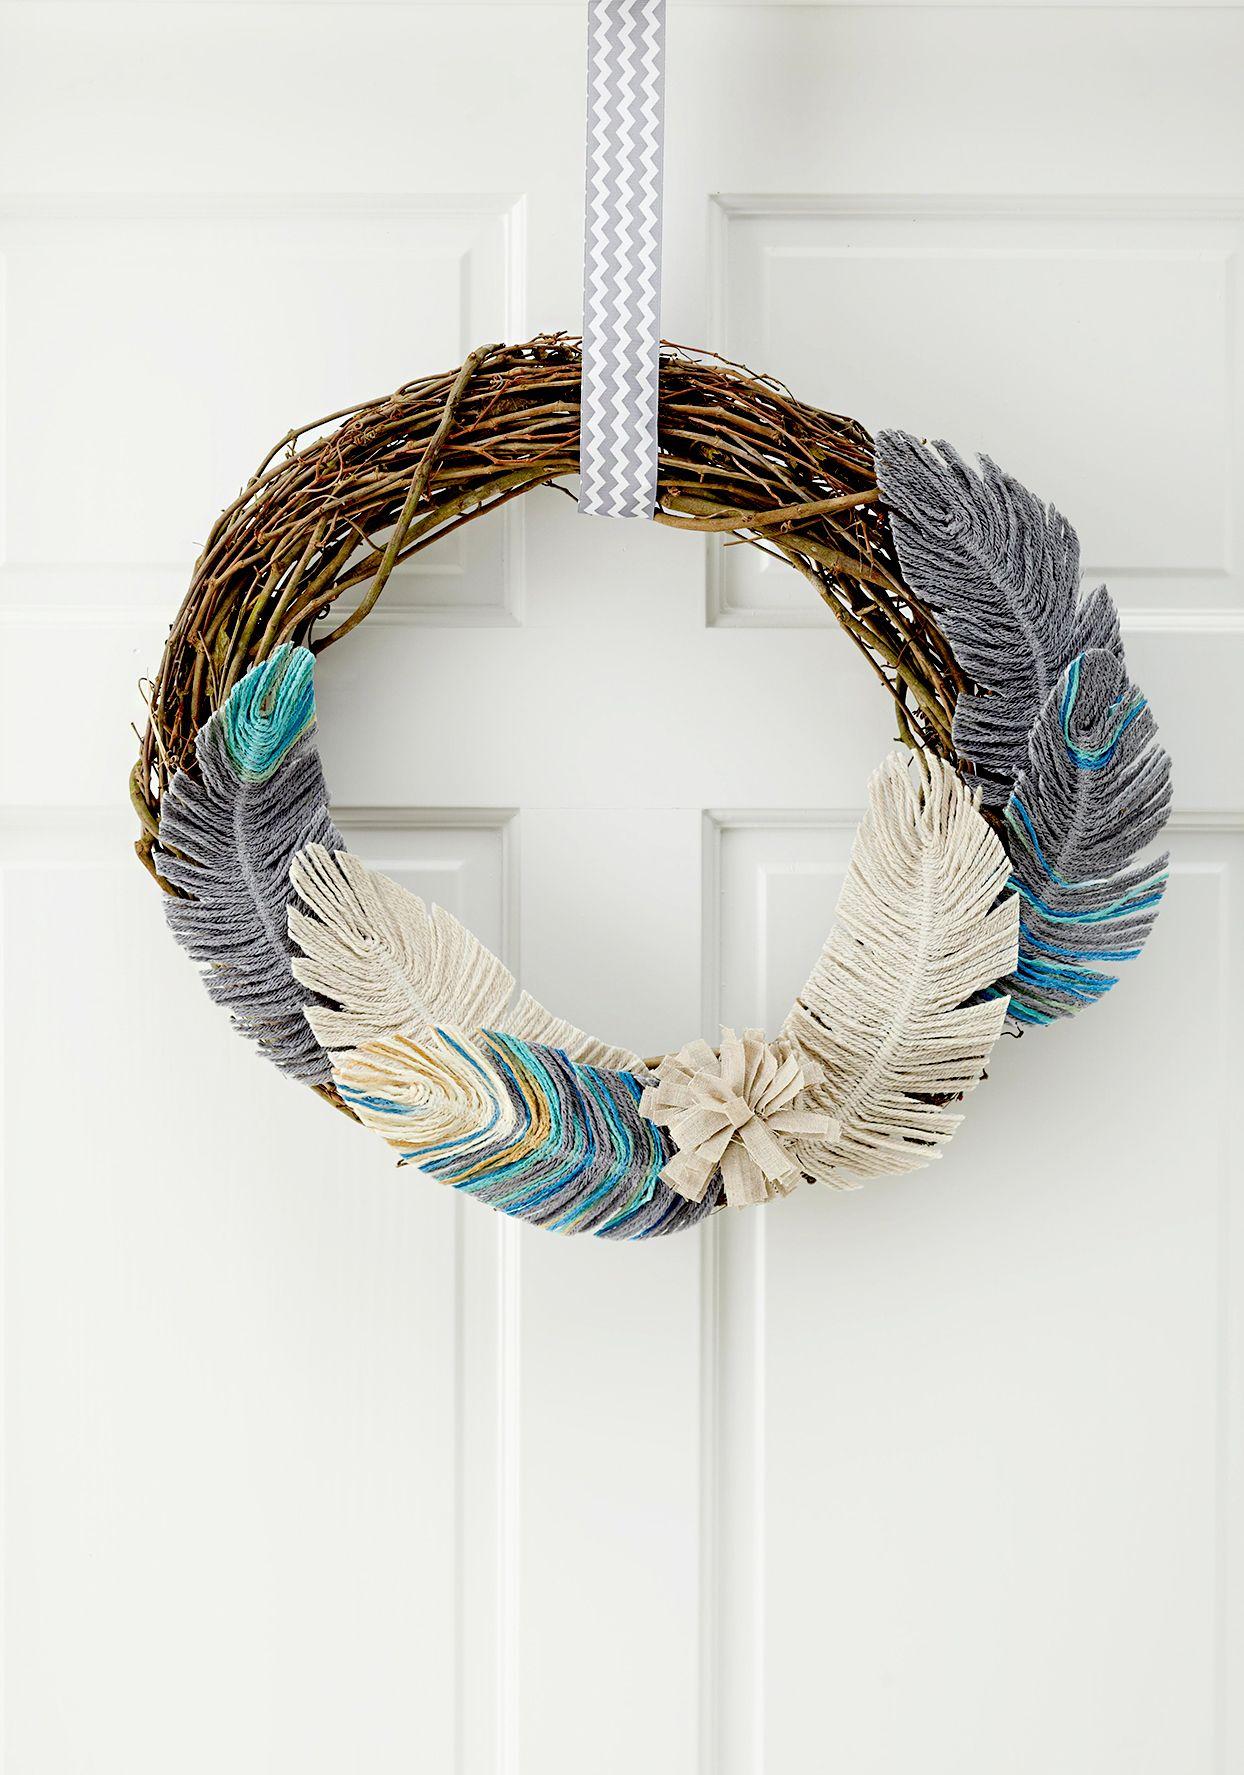 30 Modern Fall Wreath Ideas to Update Your Front Door ...